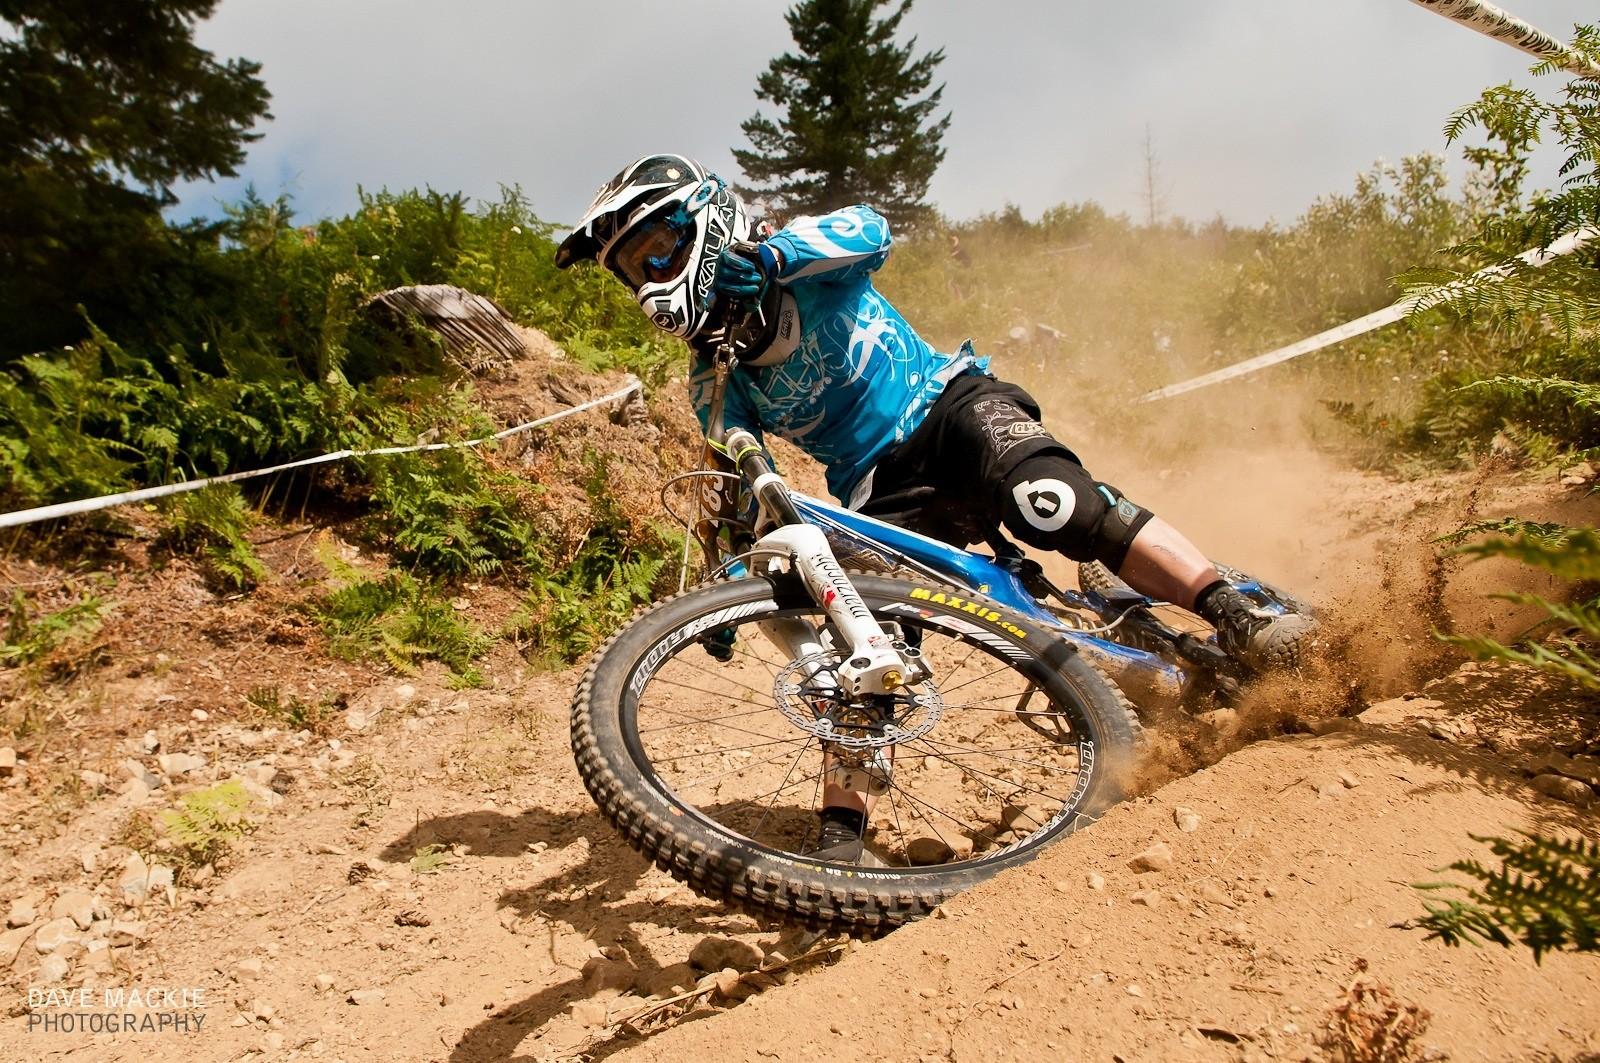 Dirty Jane 5 - sparkplug - Mountain Biking Pictures - Vital MTB